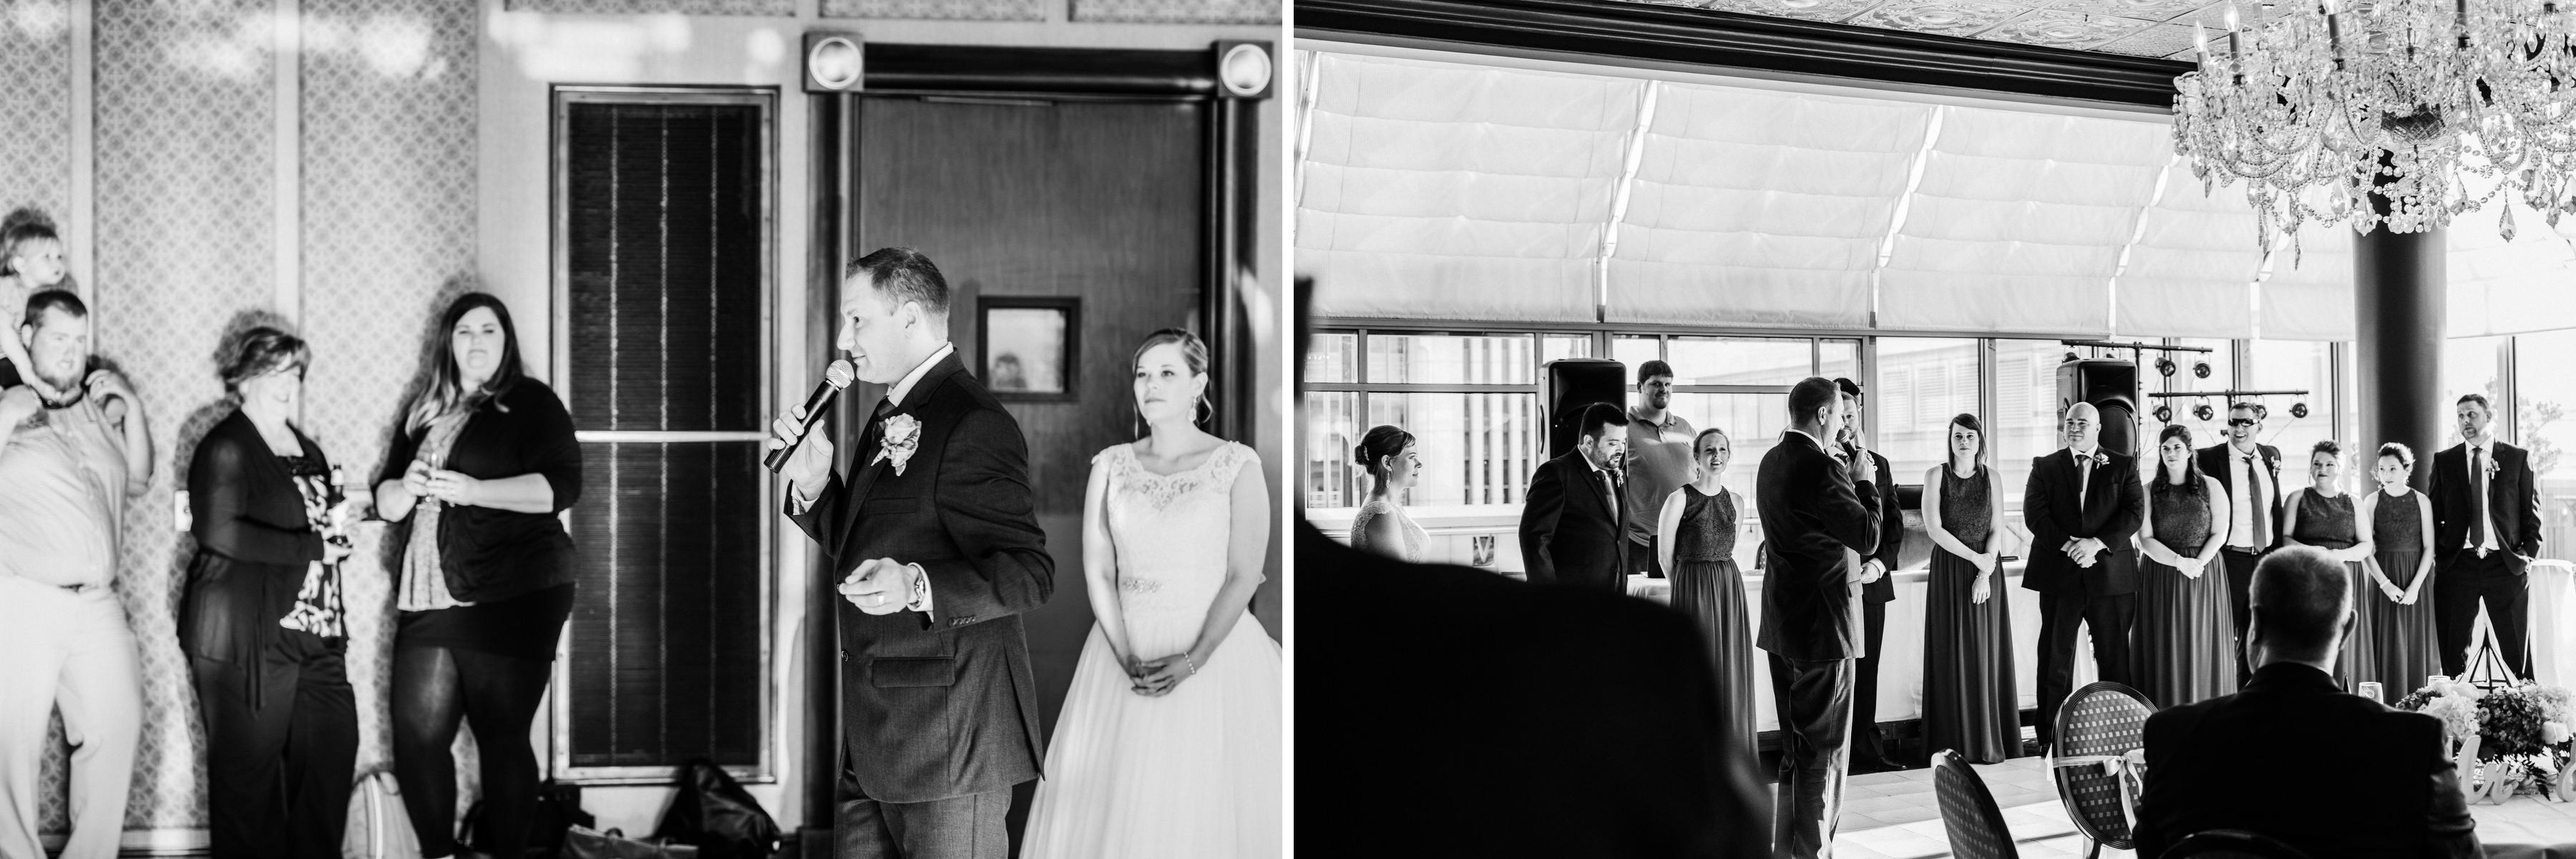 MAULDIN_WEDDING_MONTGOMERY_ALABAMA_WEDDING_PHOTOGRAPHY_106